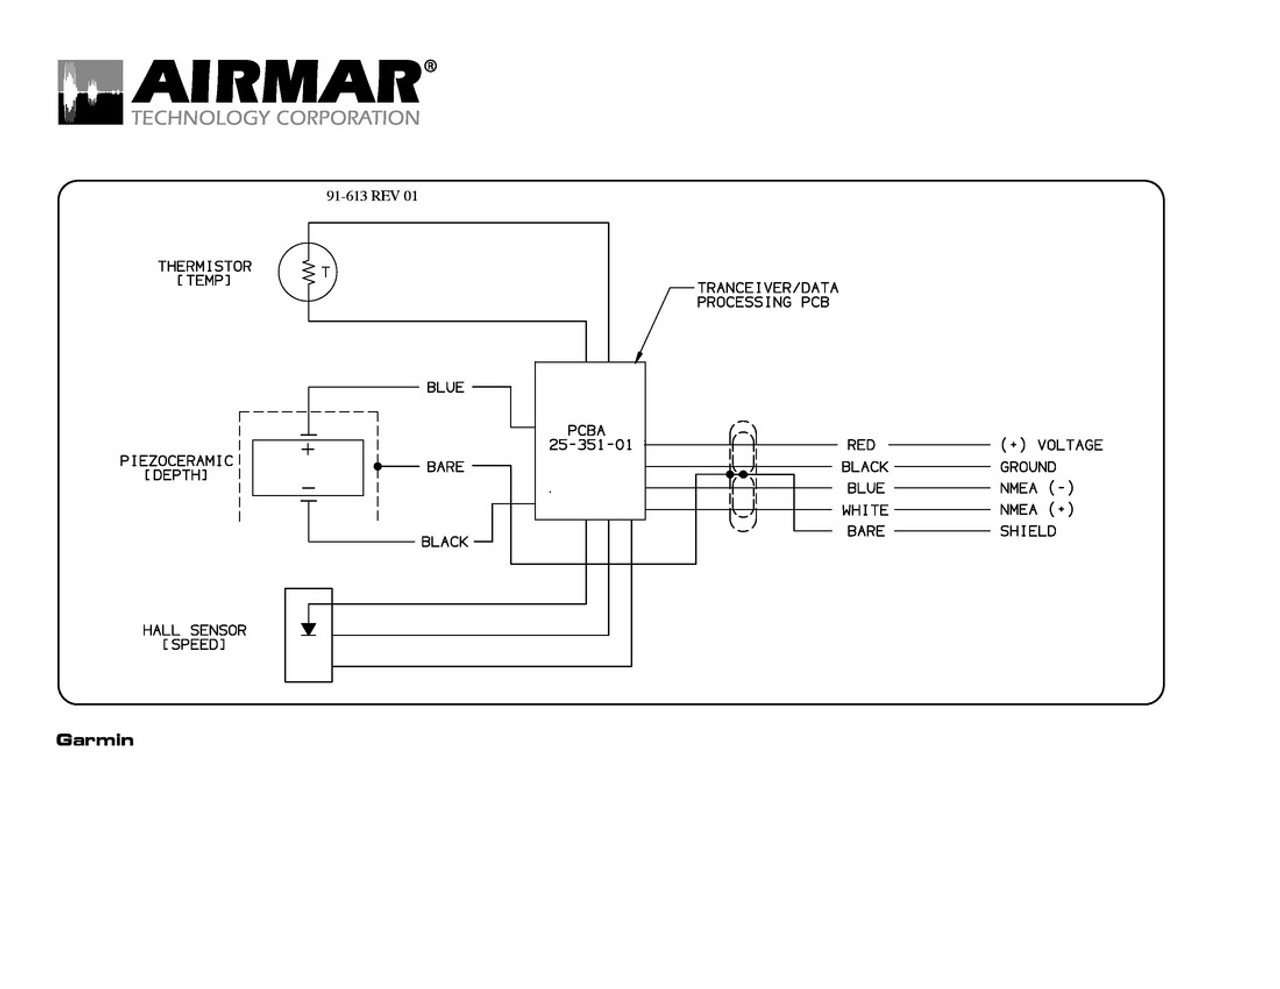 Garmin Gsd 22 Wiring Diagram | Wiring Liry on